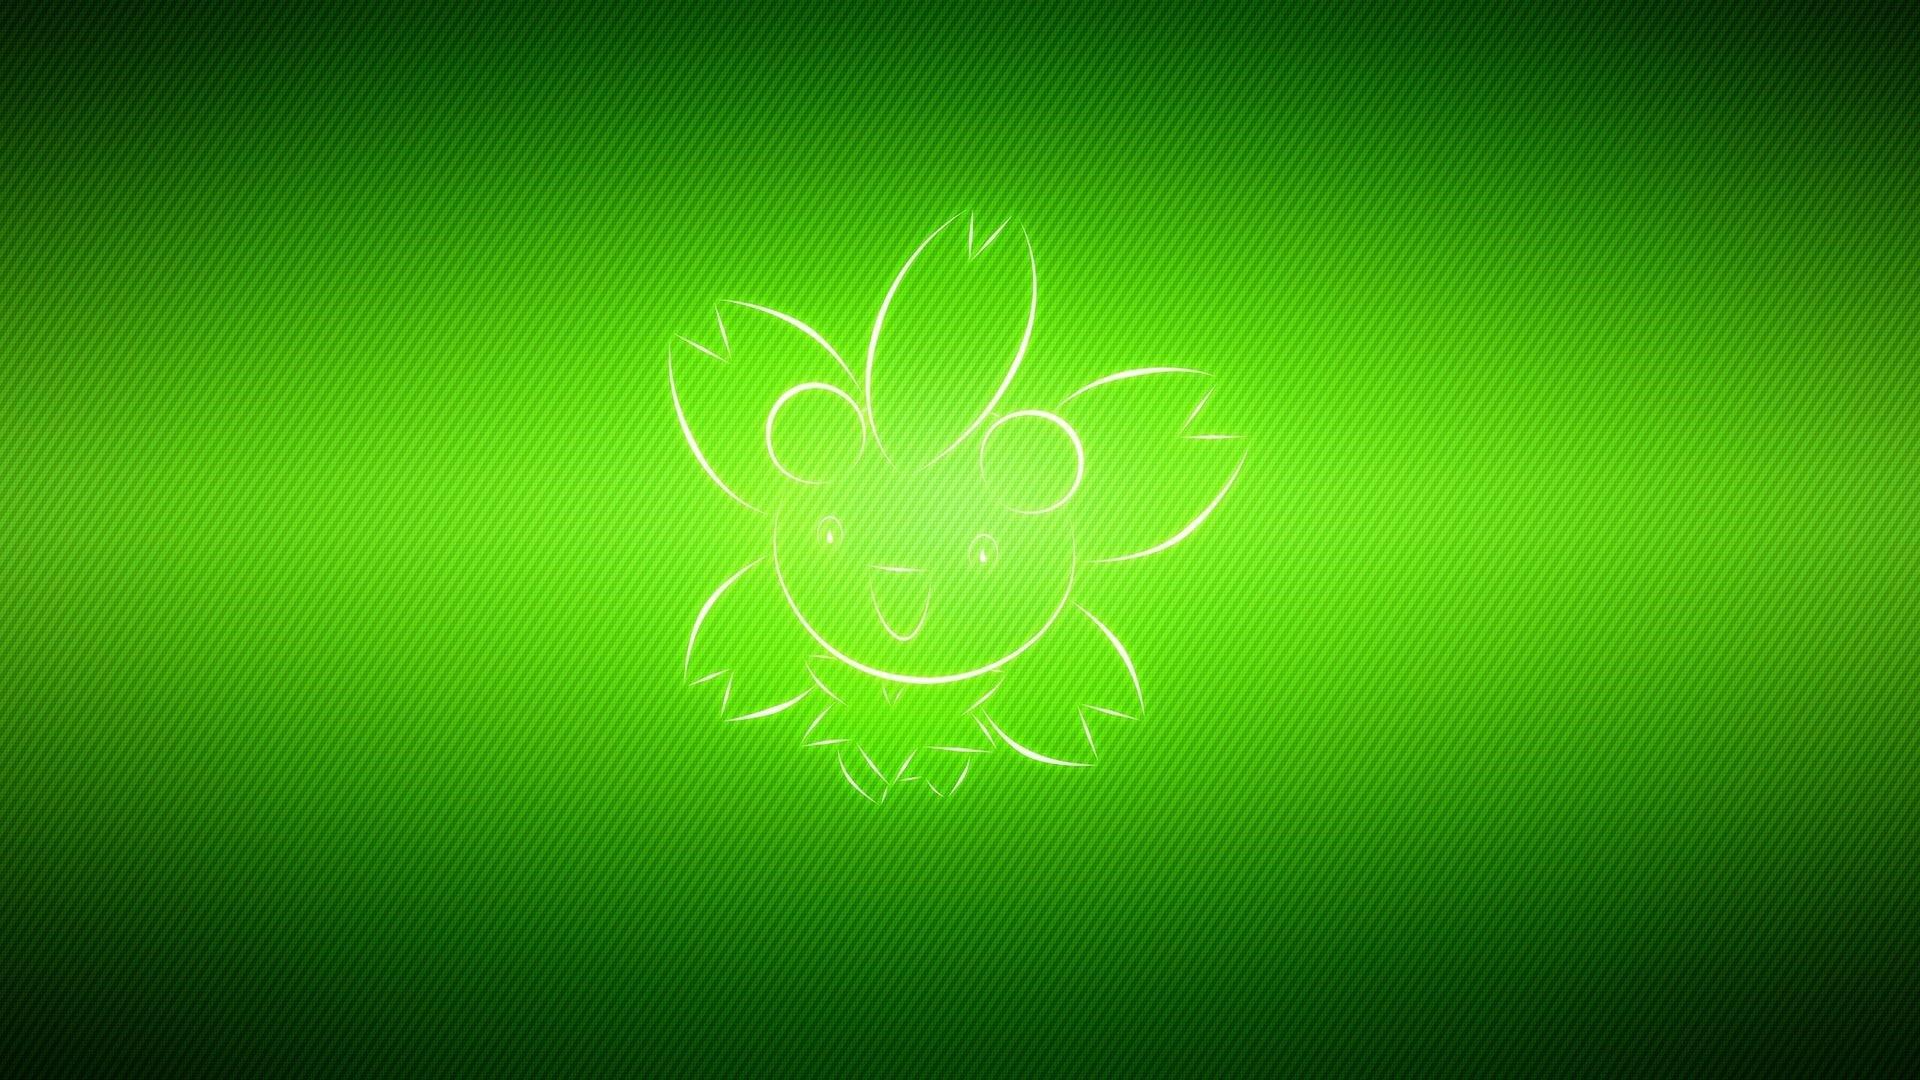 Spark Green Download Wallpaper